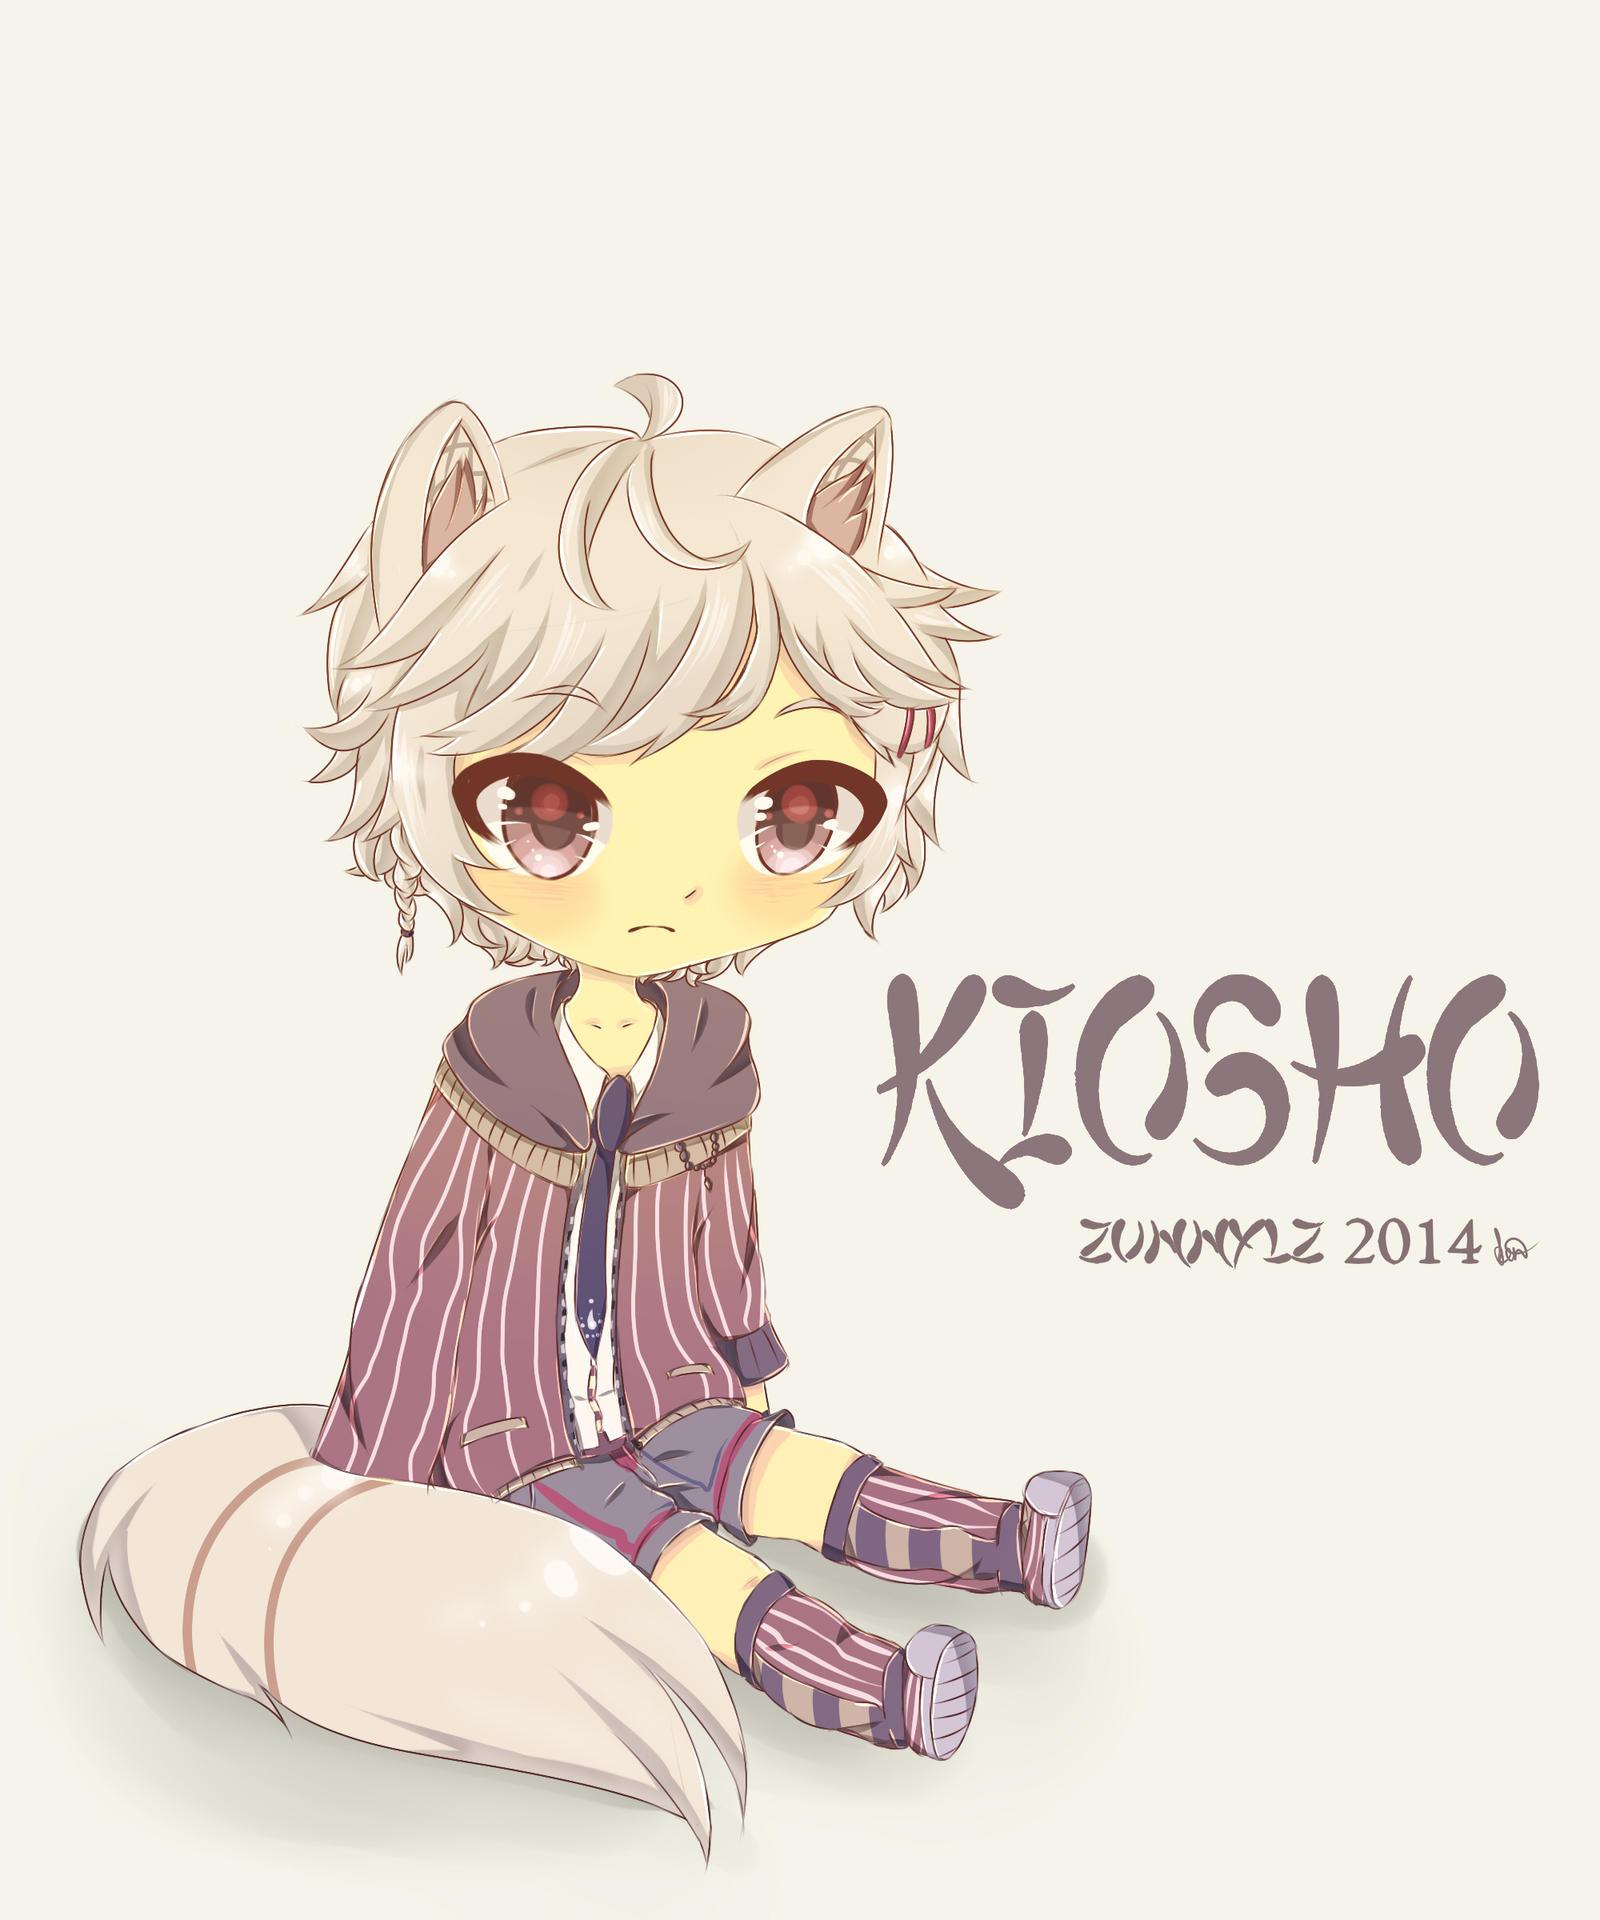 Kiosho by Leniuu